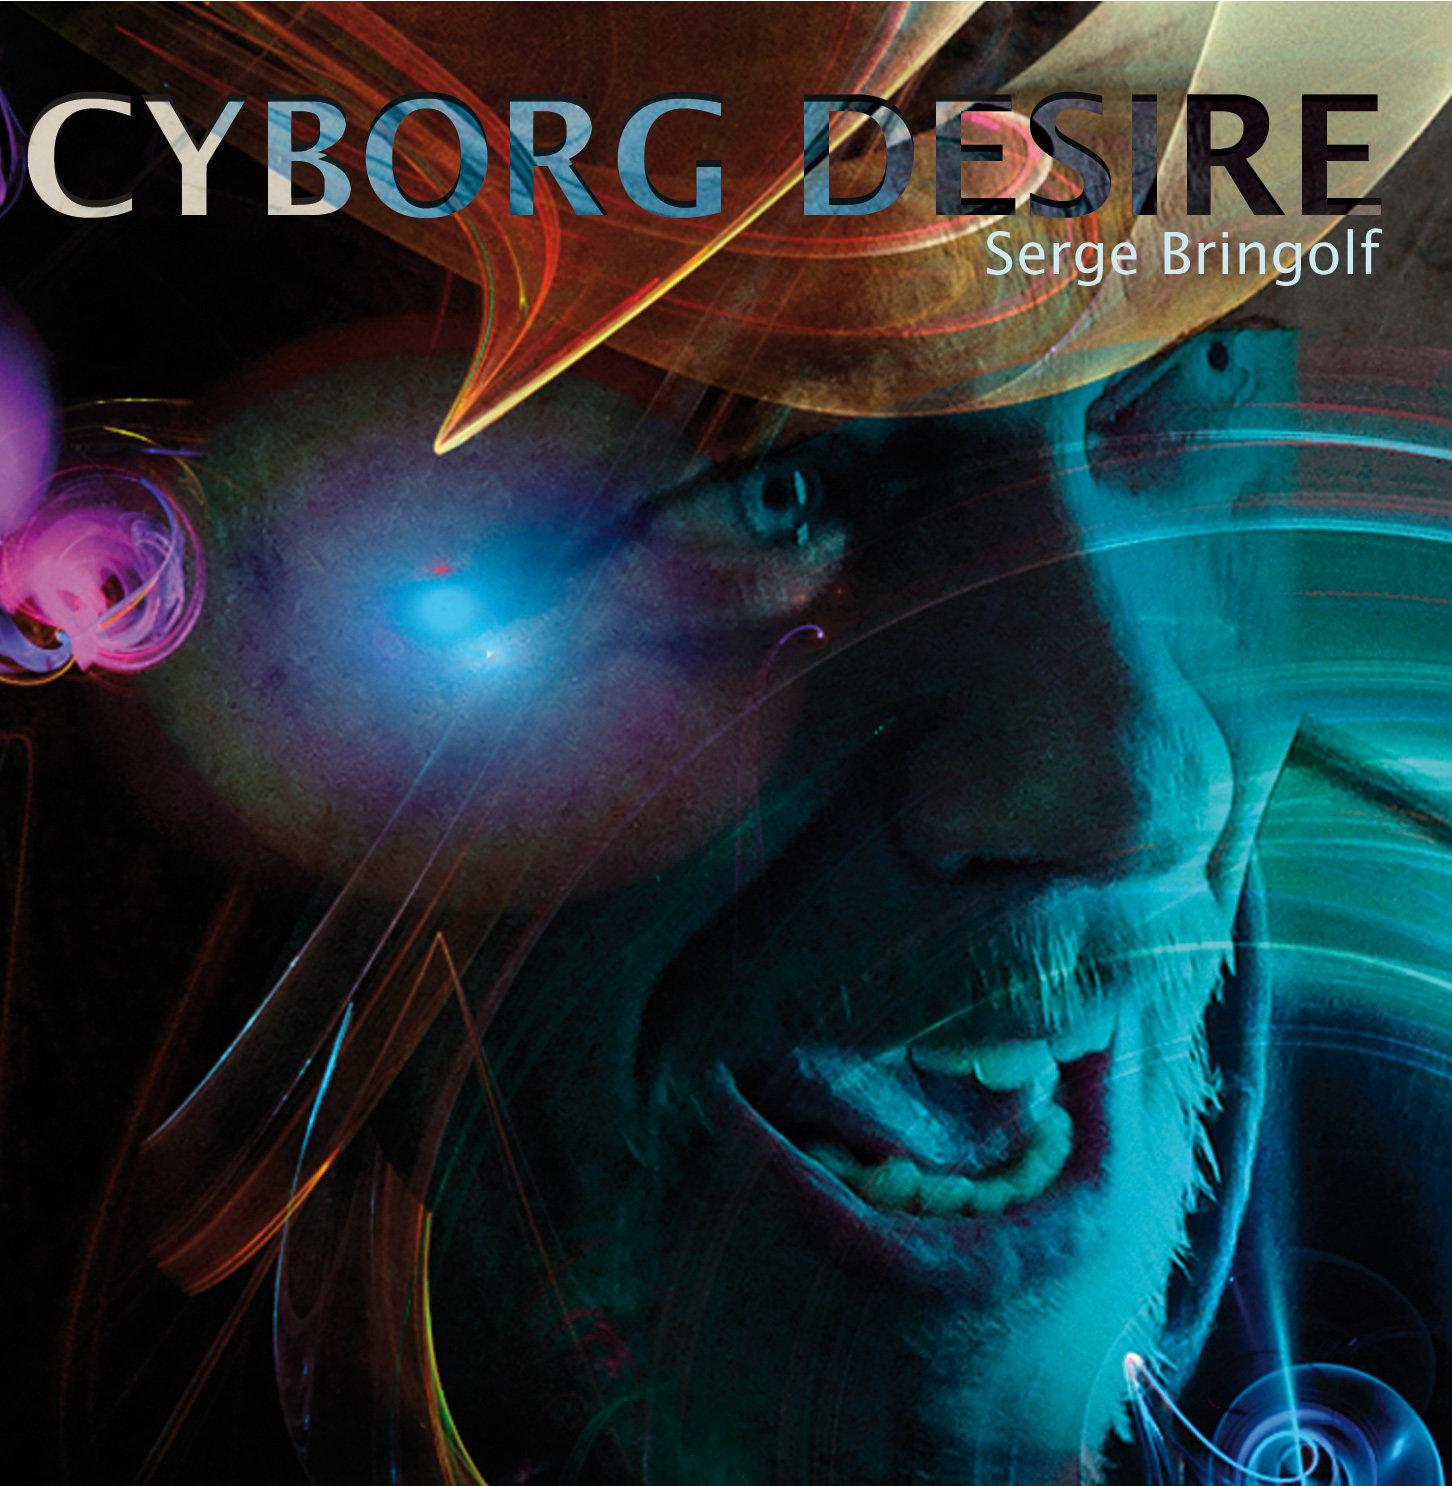 CD - CYBORG DESIRE